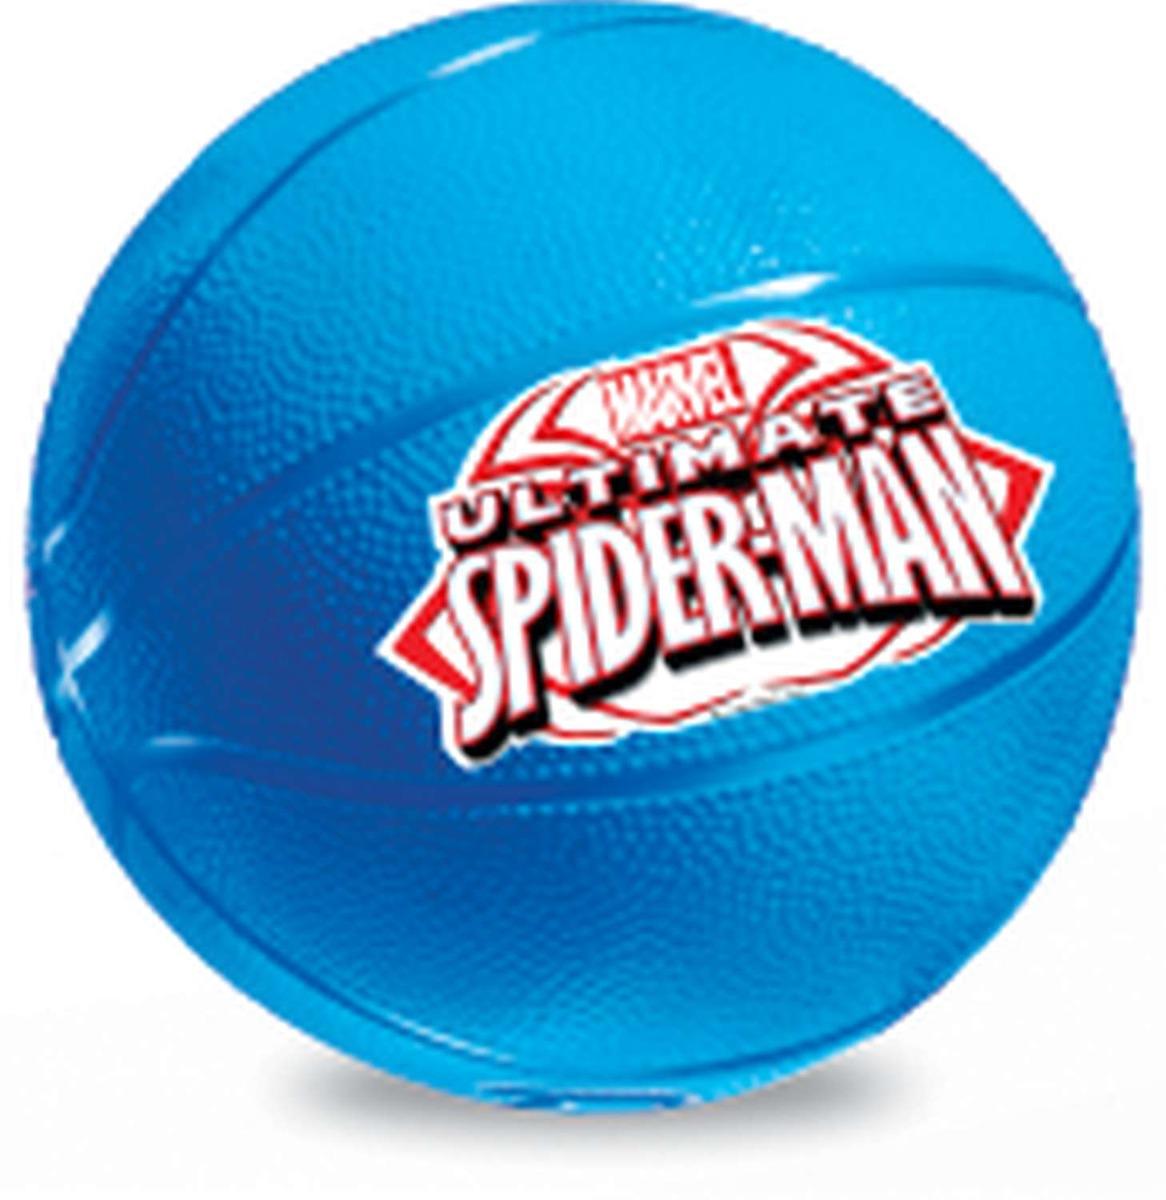 Tabela De Basquete Spider-man Tabela+bola - R  119 8d3e5034e96f2